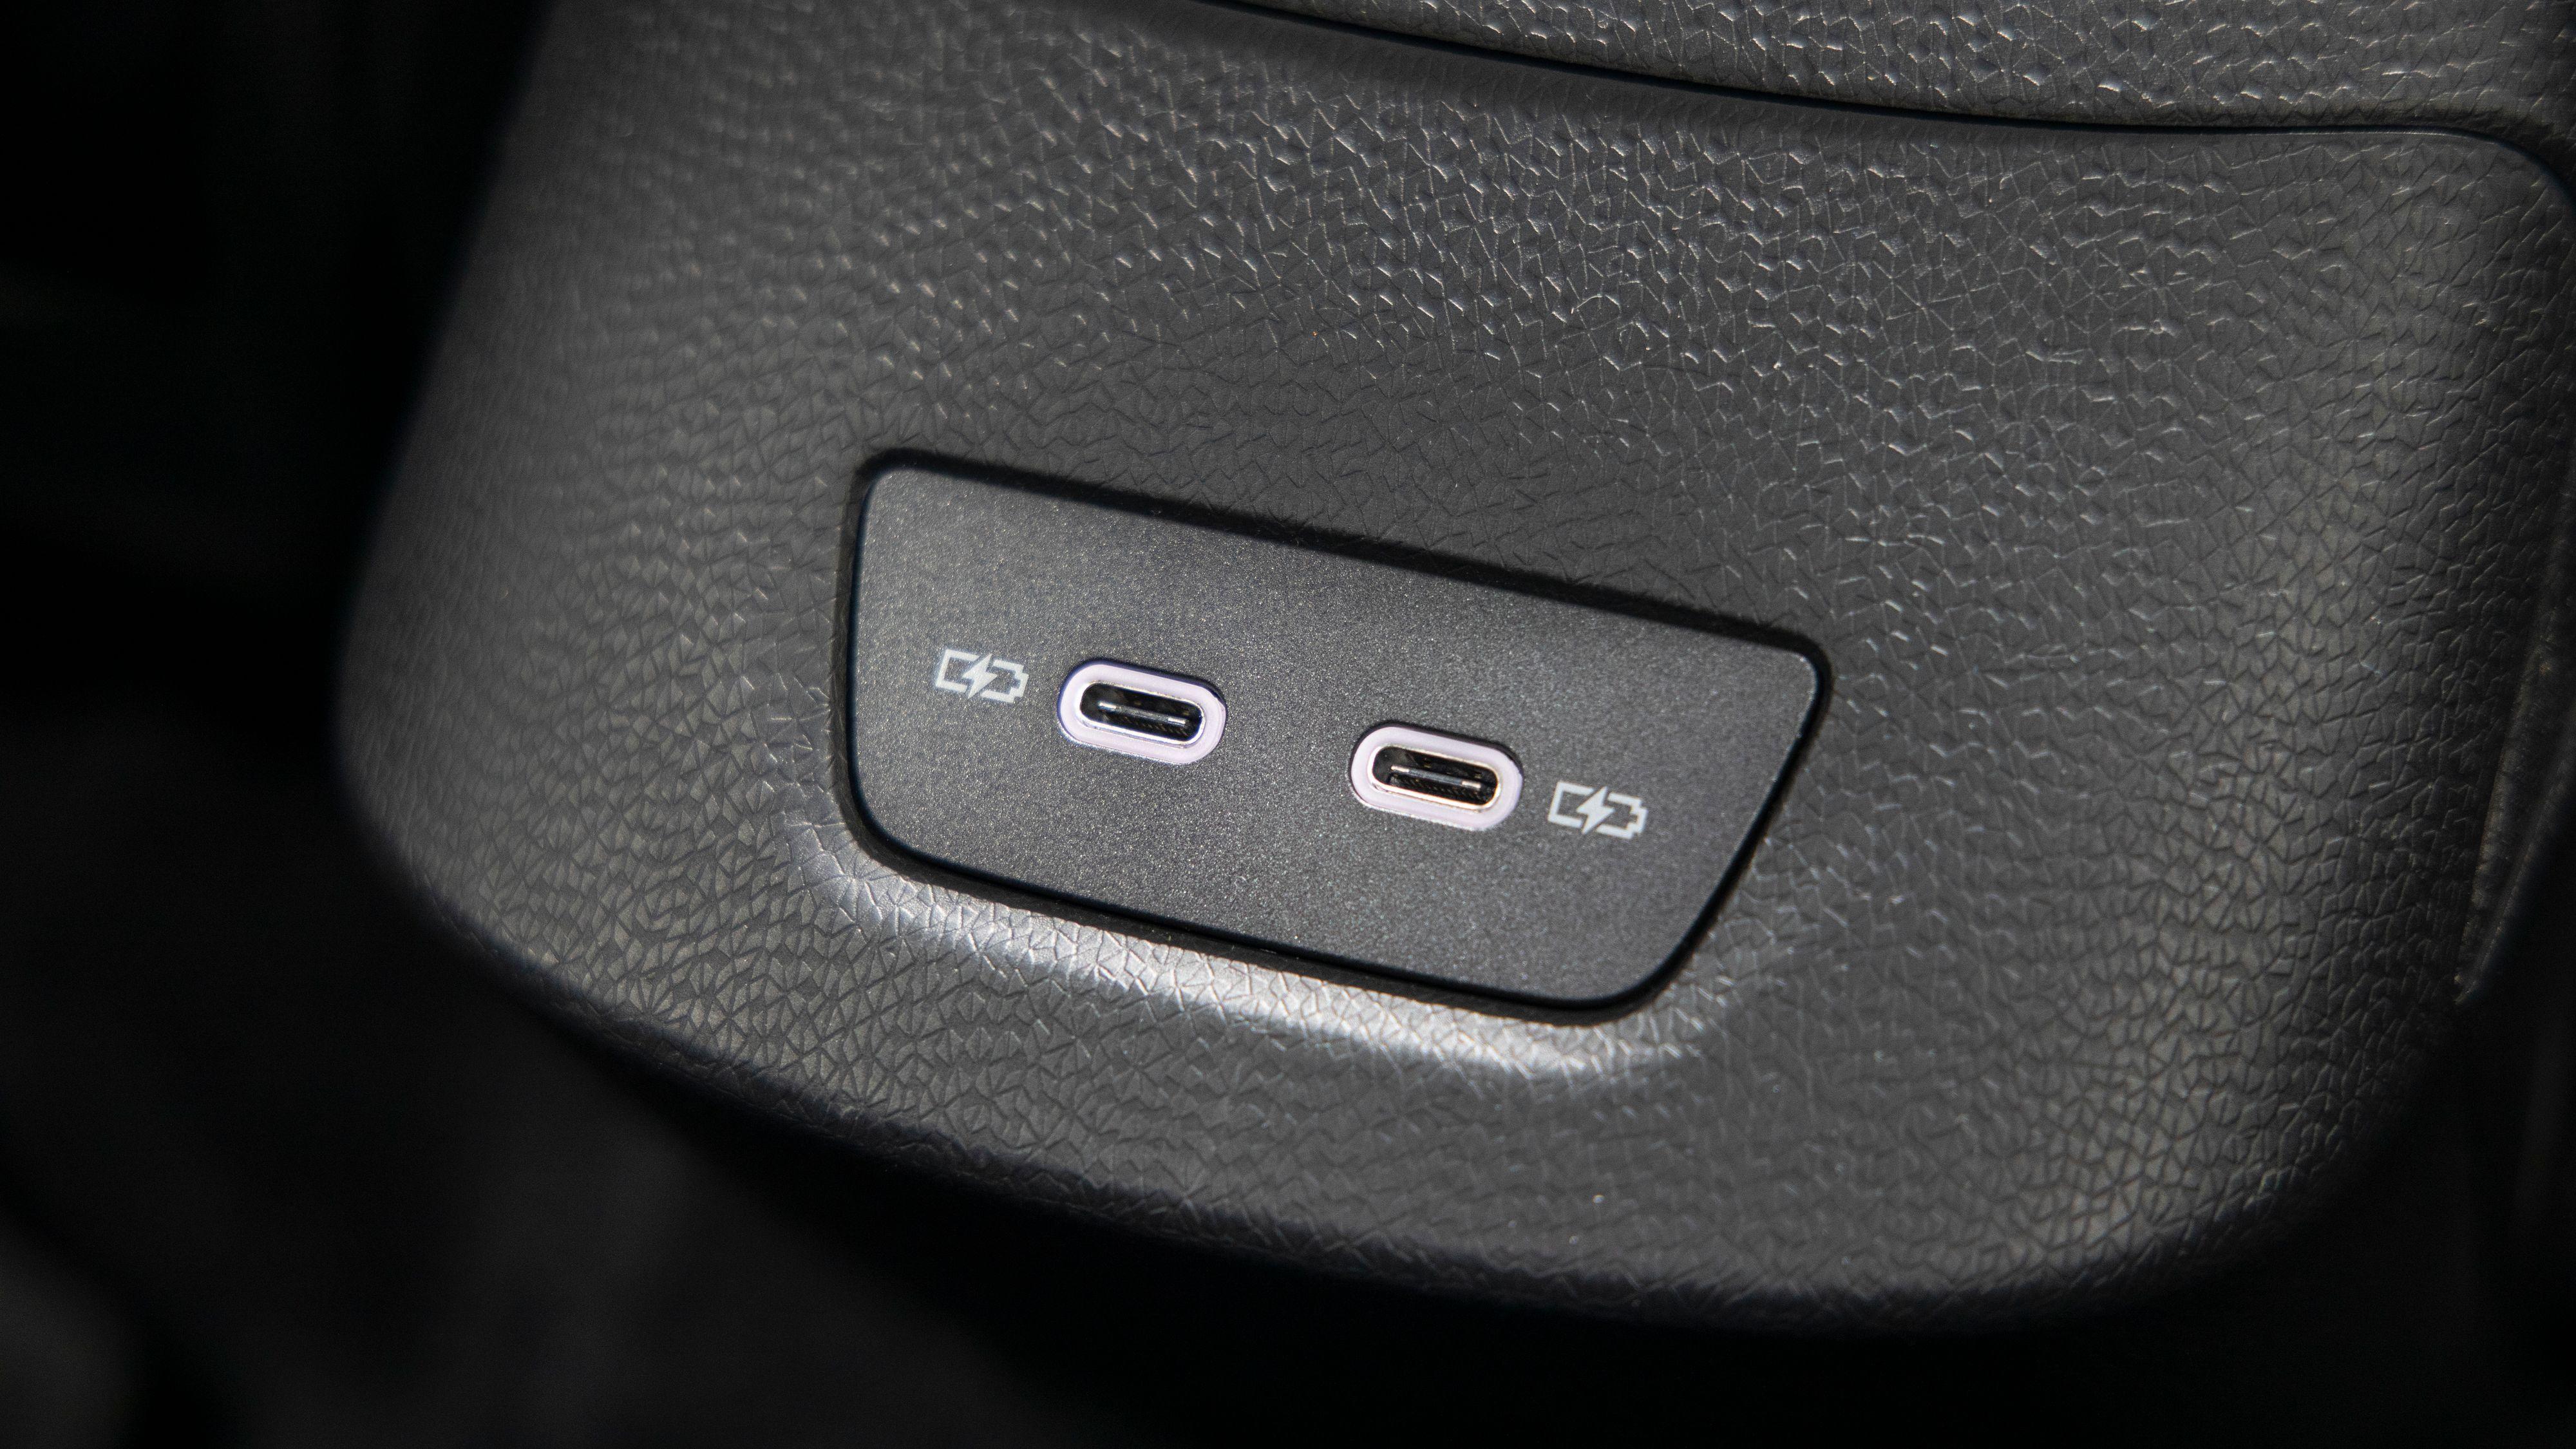 USB-C-porter er noe vi er glade for å se i en bil.